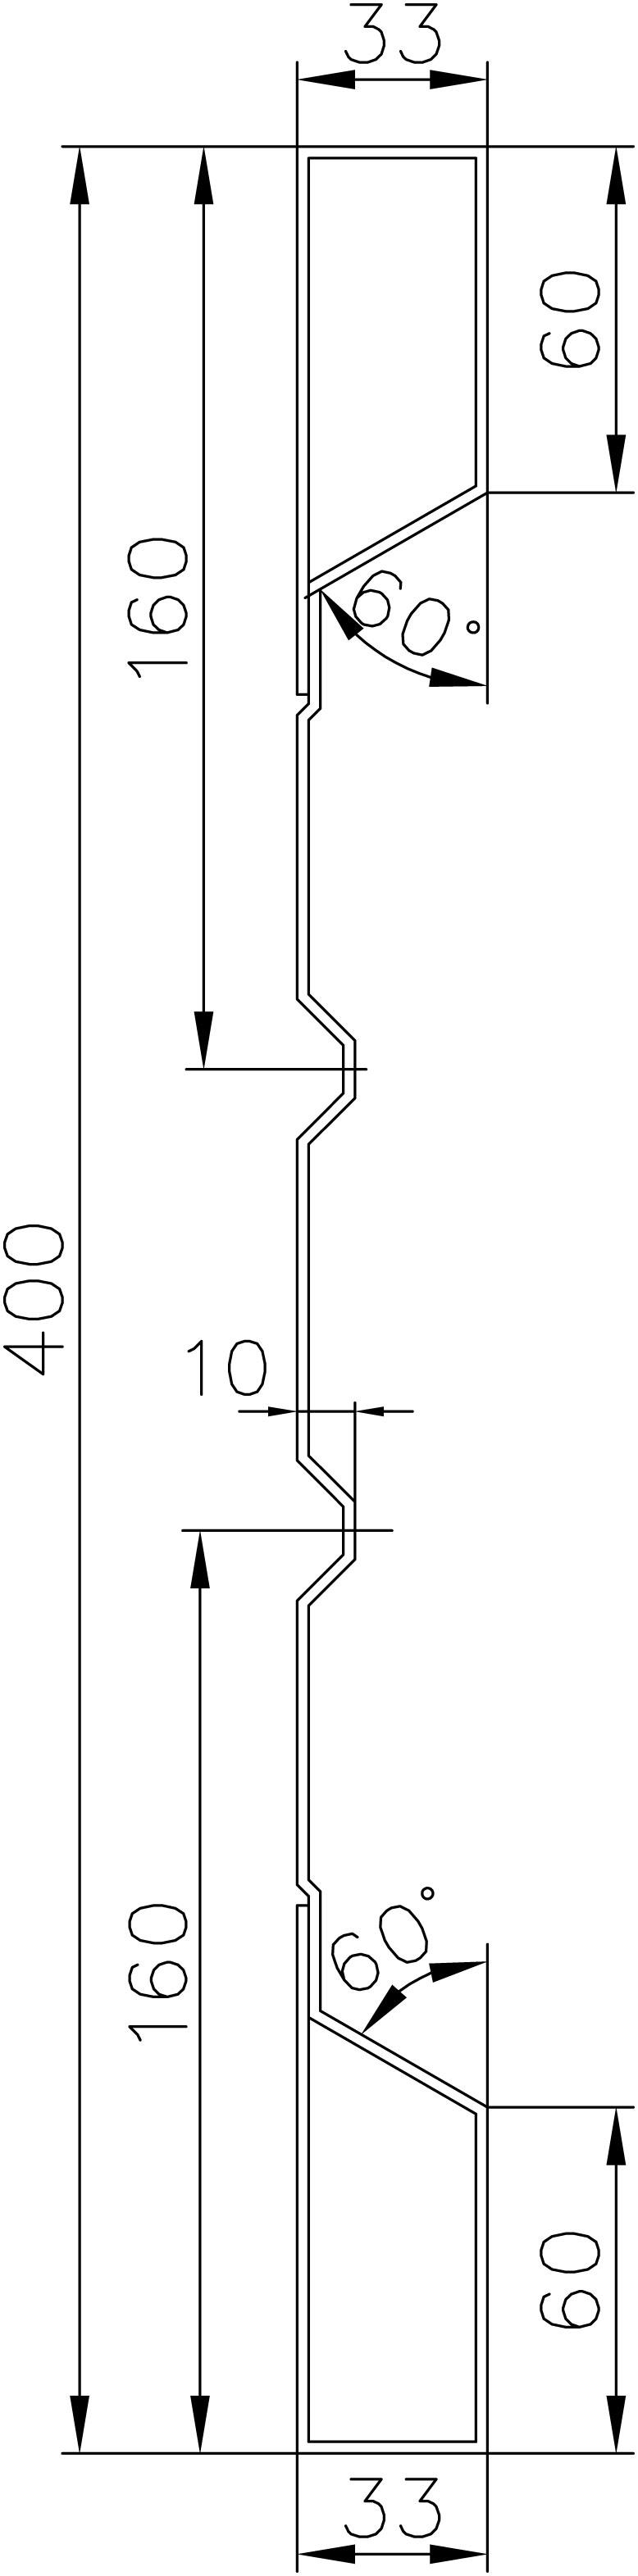 Brantner Kipper und Anhänger - SmE HVKT 400x2 1820 Winkel 40/20/5